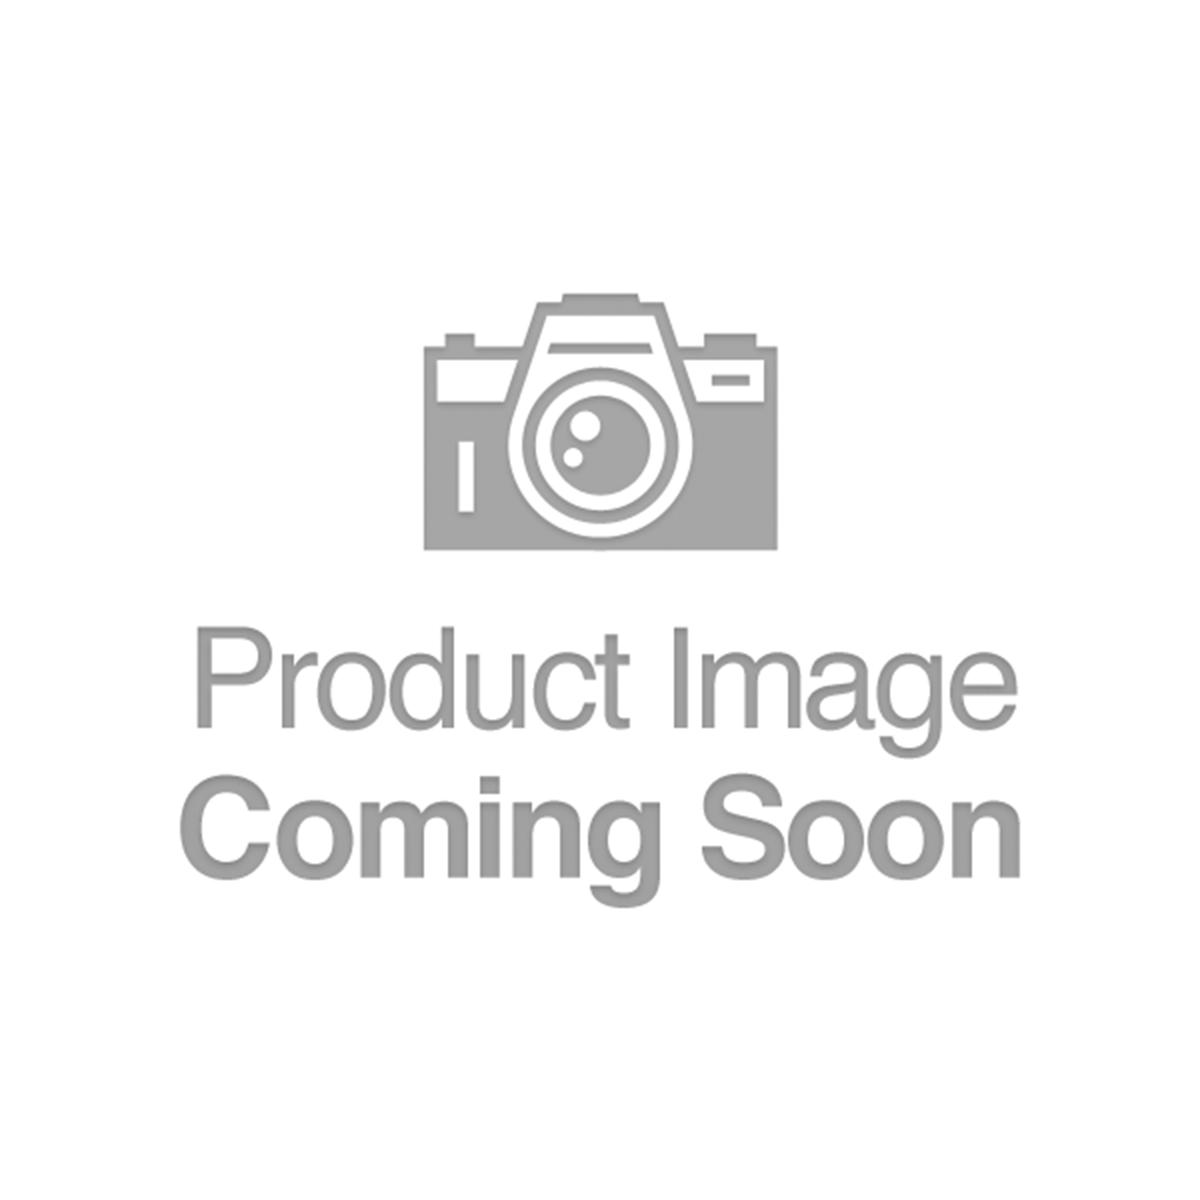 Brownsville - Tennessee - CH 6042 - FR545 - PMG 15